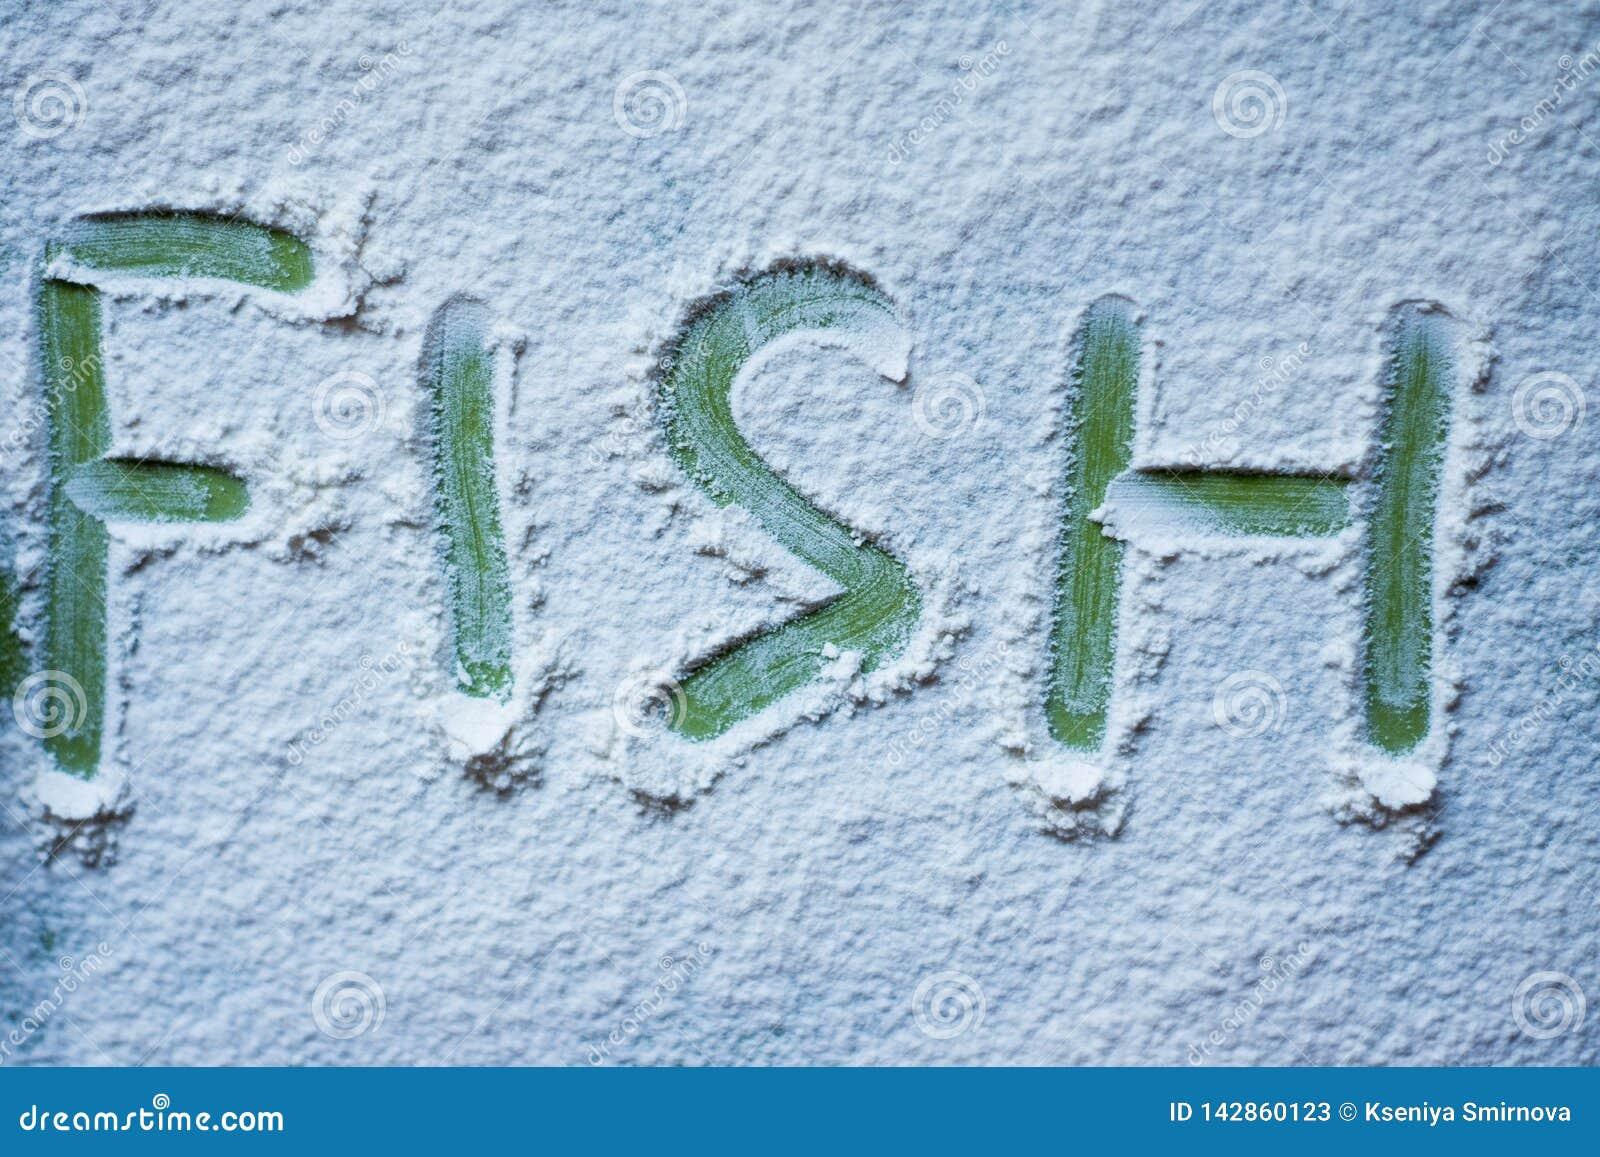 O peixe verde da palavra é escrito na farinha